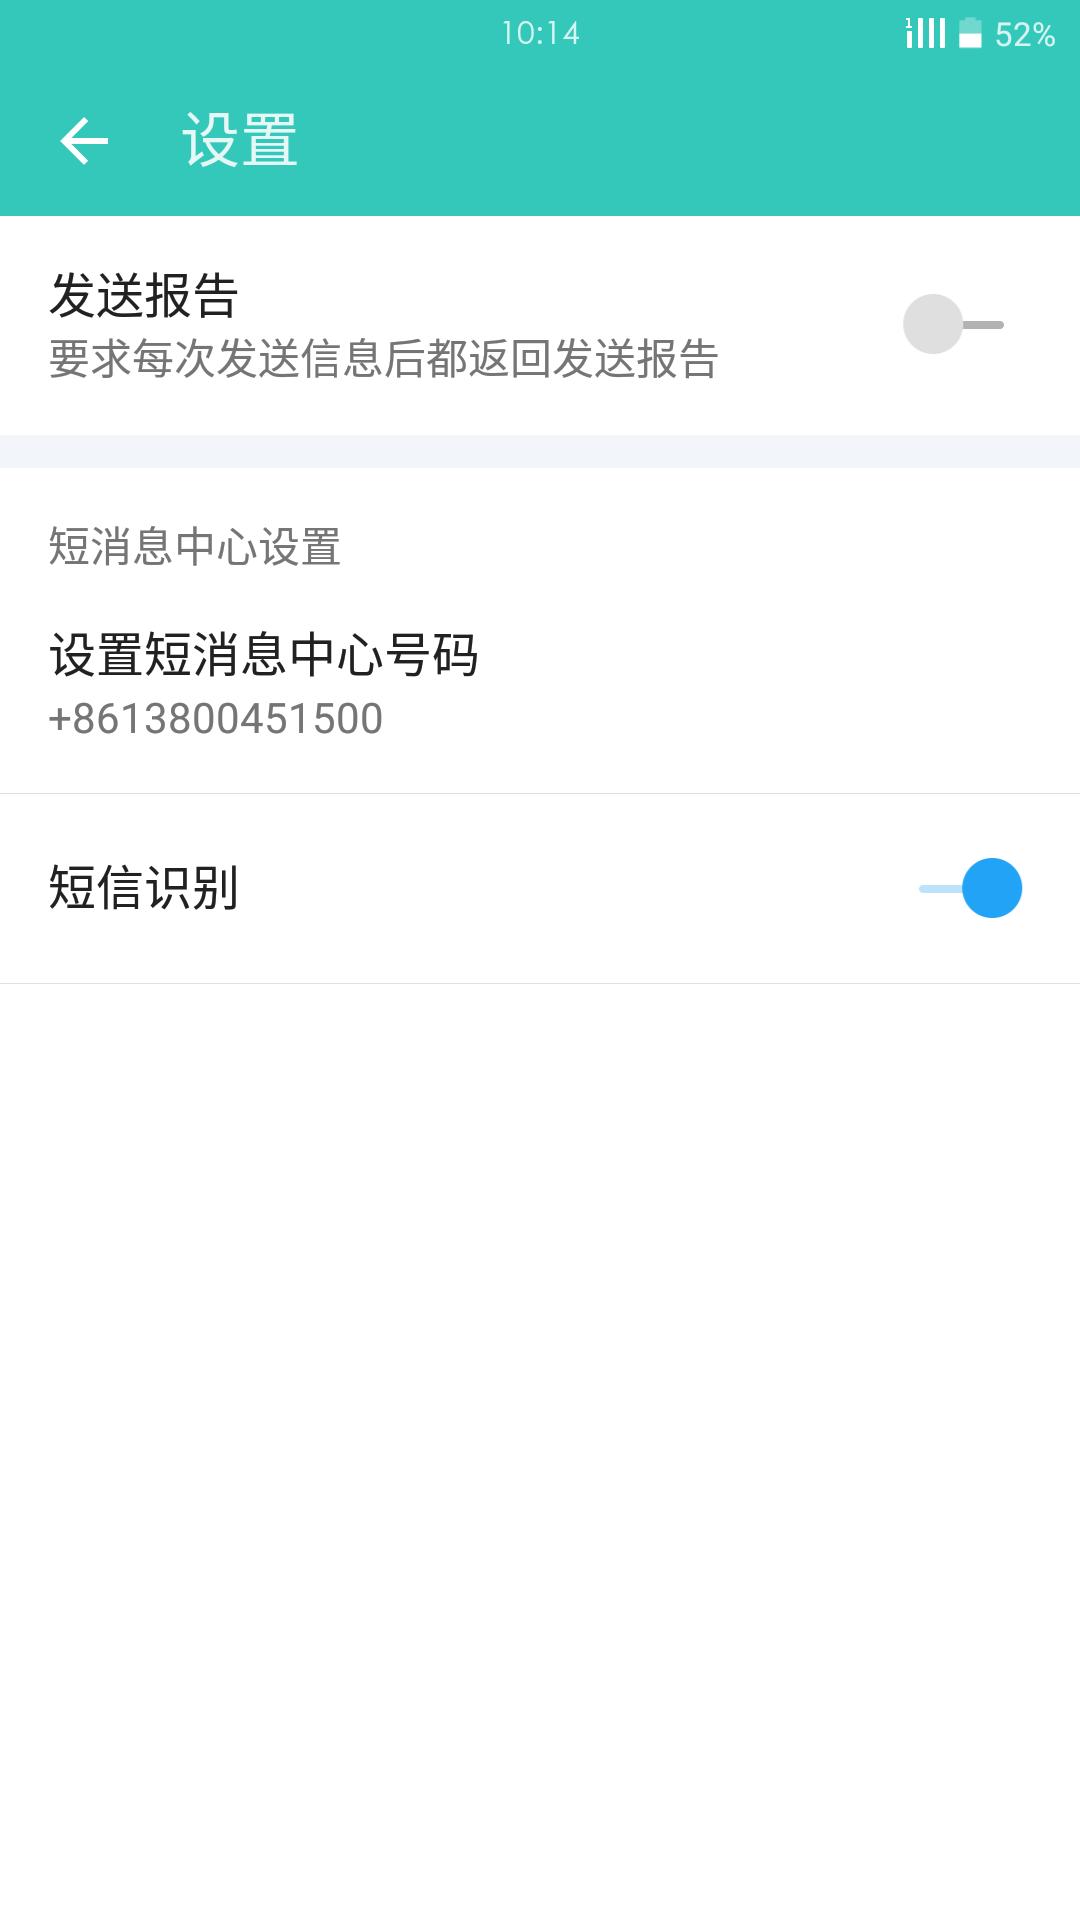 Screenshot_2015-08-15-10-14-12.png